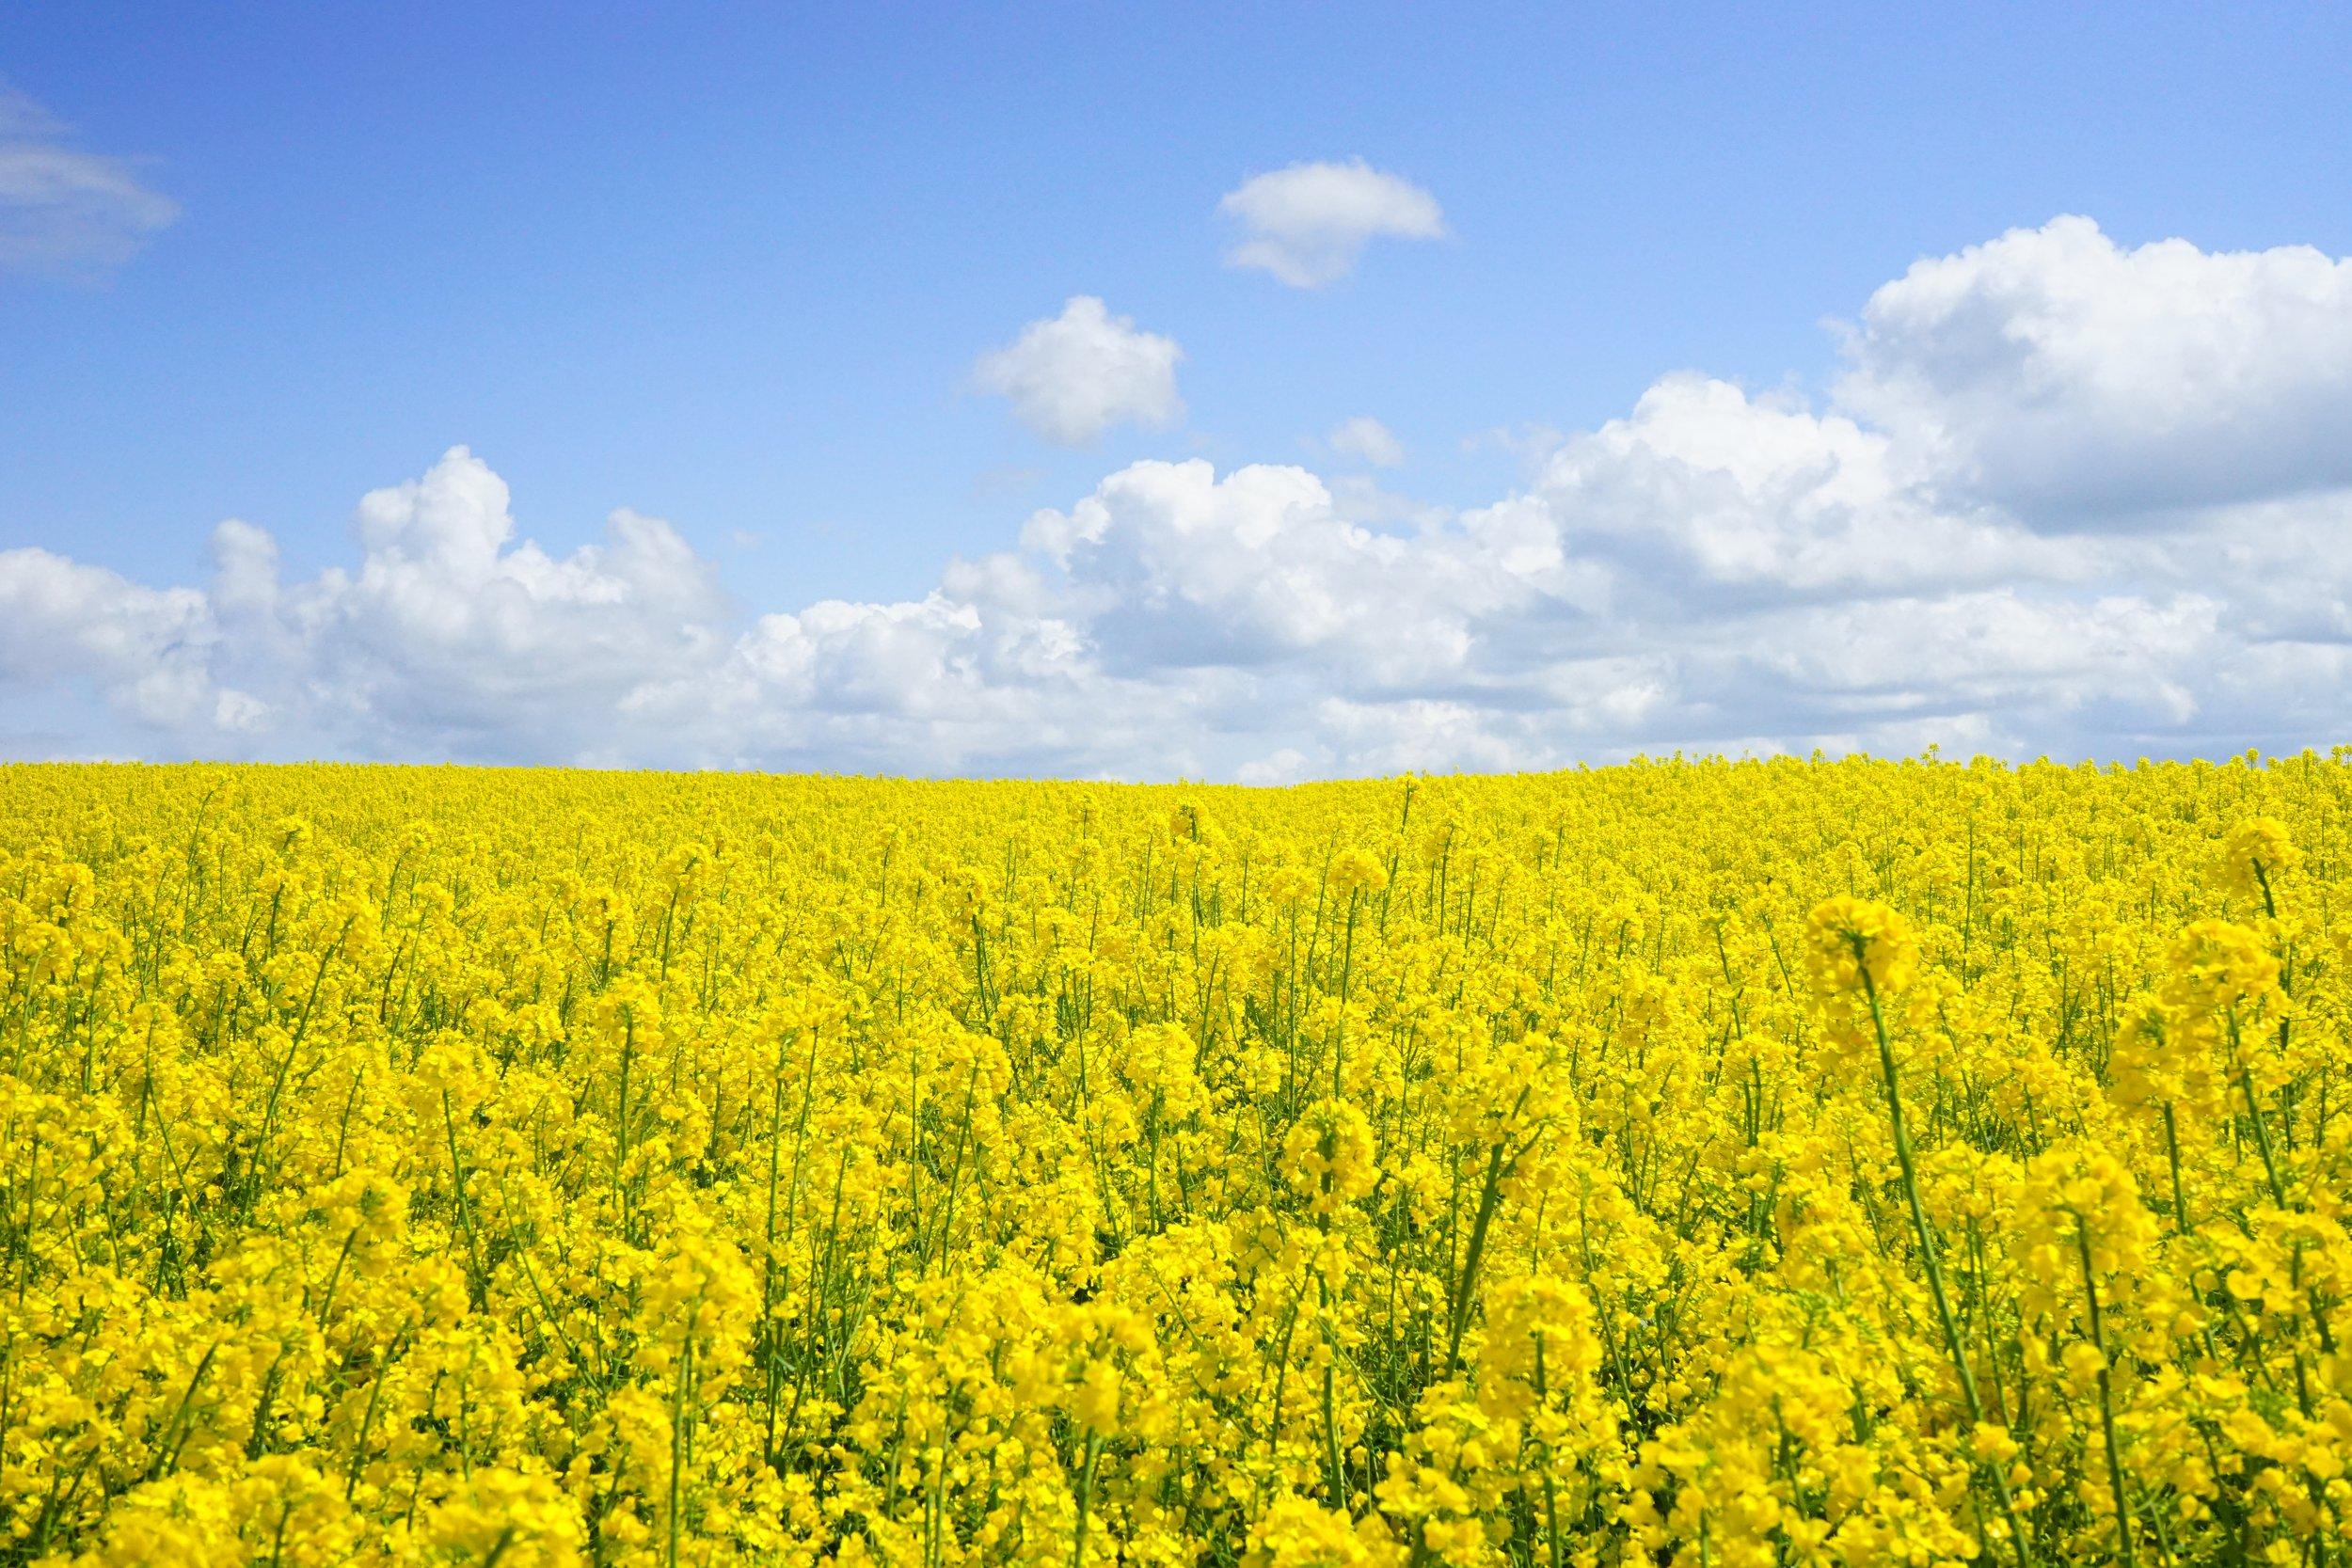 field-of-rapeseeds-oilseed-rape-blutenmeer-yellow-46164.jpeg